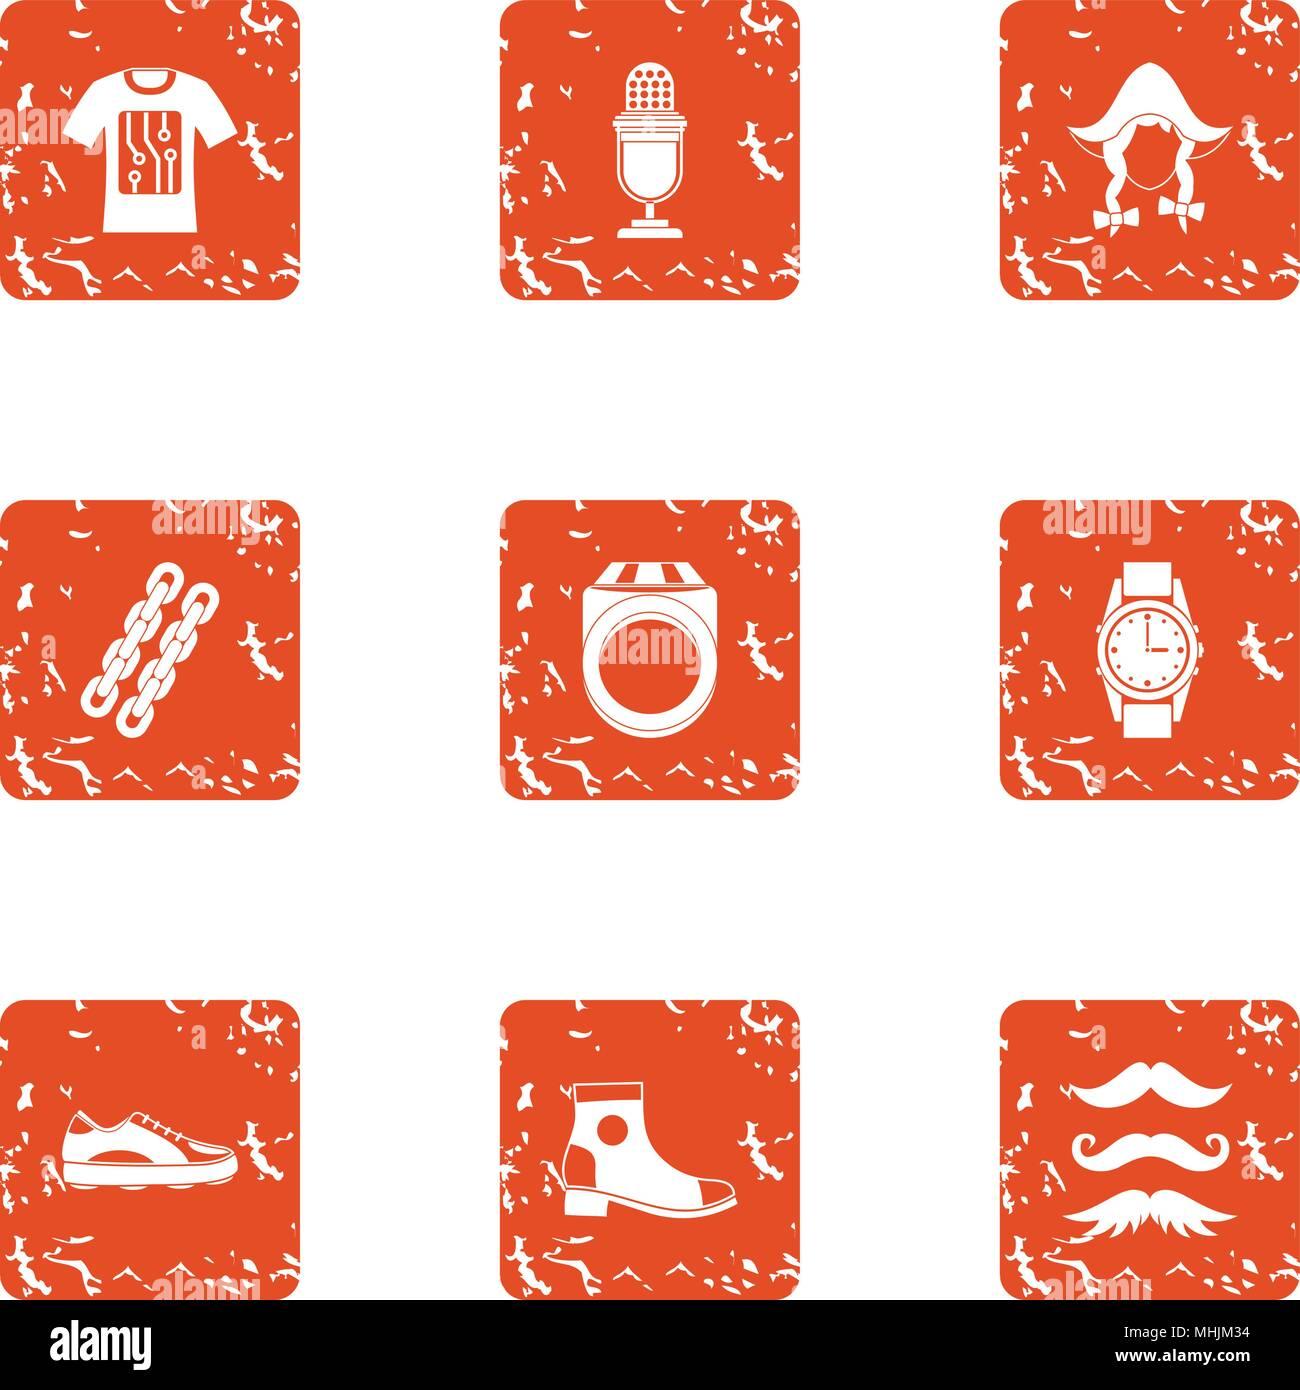 Teuton icons set, grunge style Stock Vector